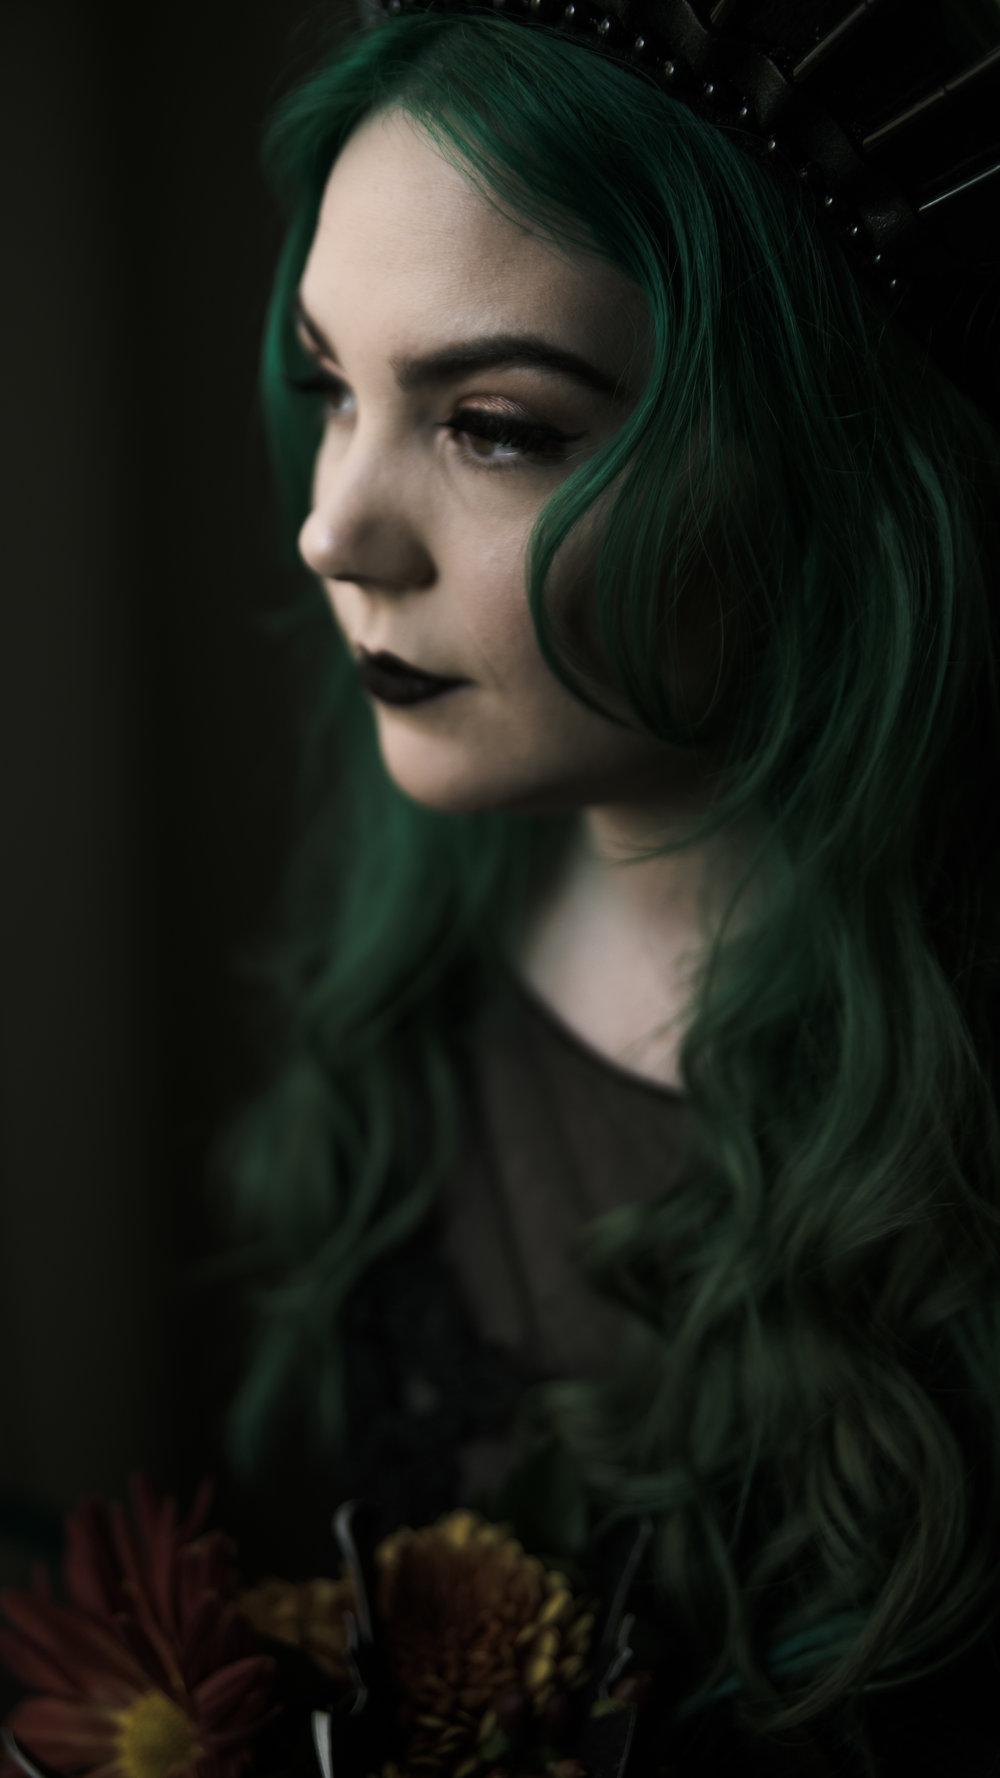 Britney Window 1 (16x9) - Dark Doll Style_.jpg